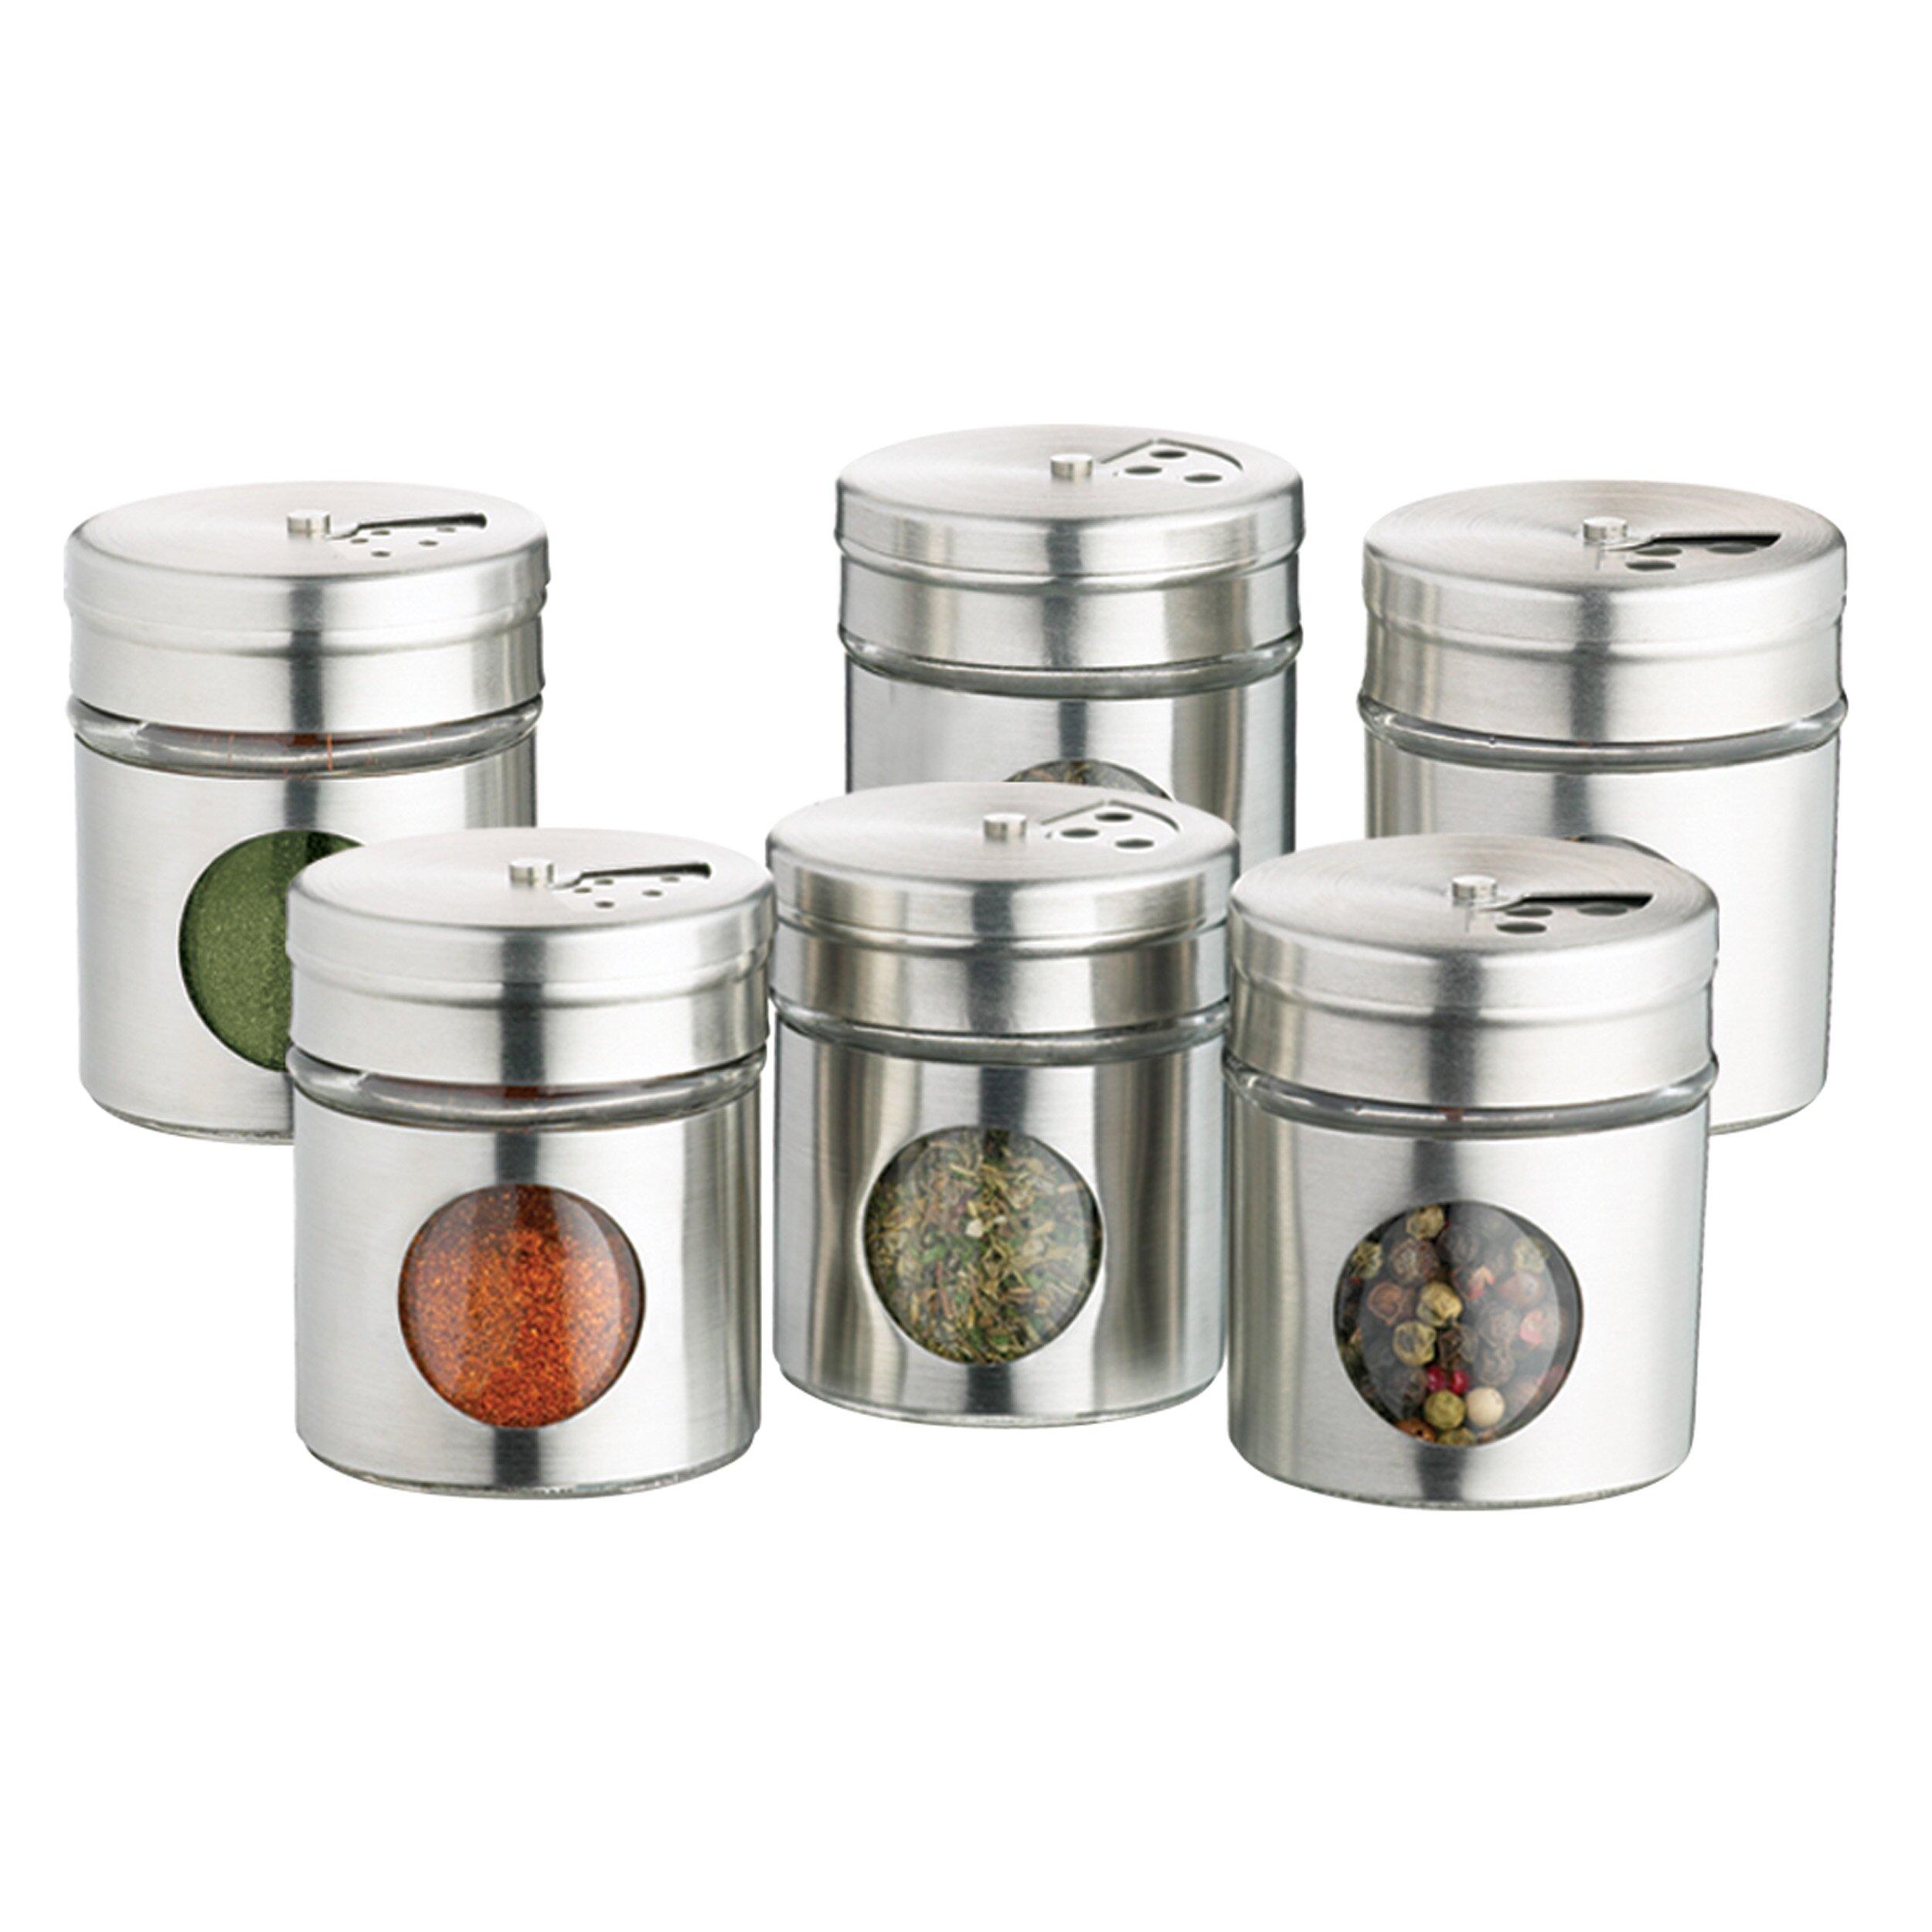 Kitchen Craft Kitchen Craft Home Made Spice Jar Reviews Wayfaircouk